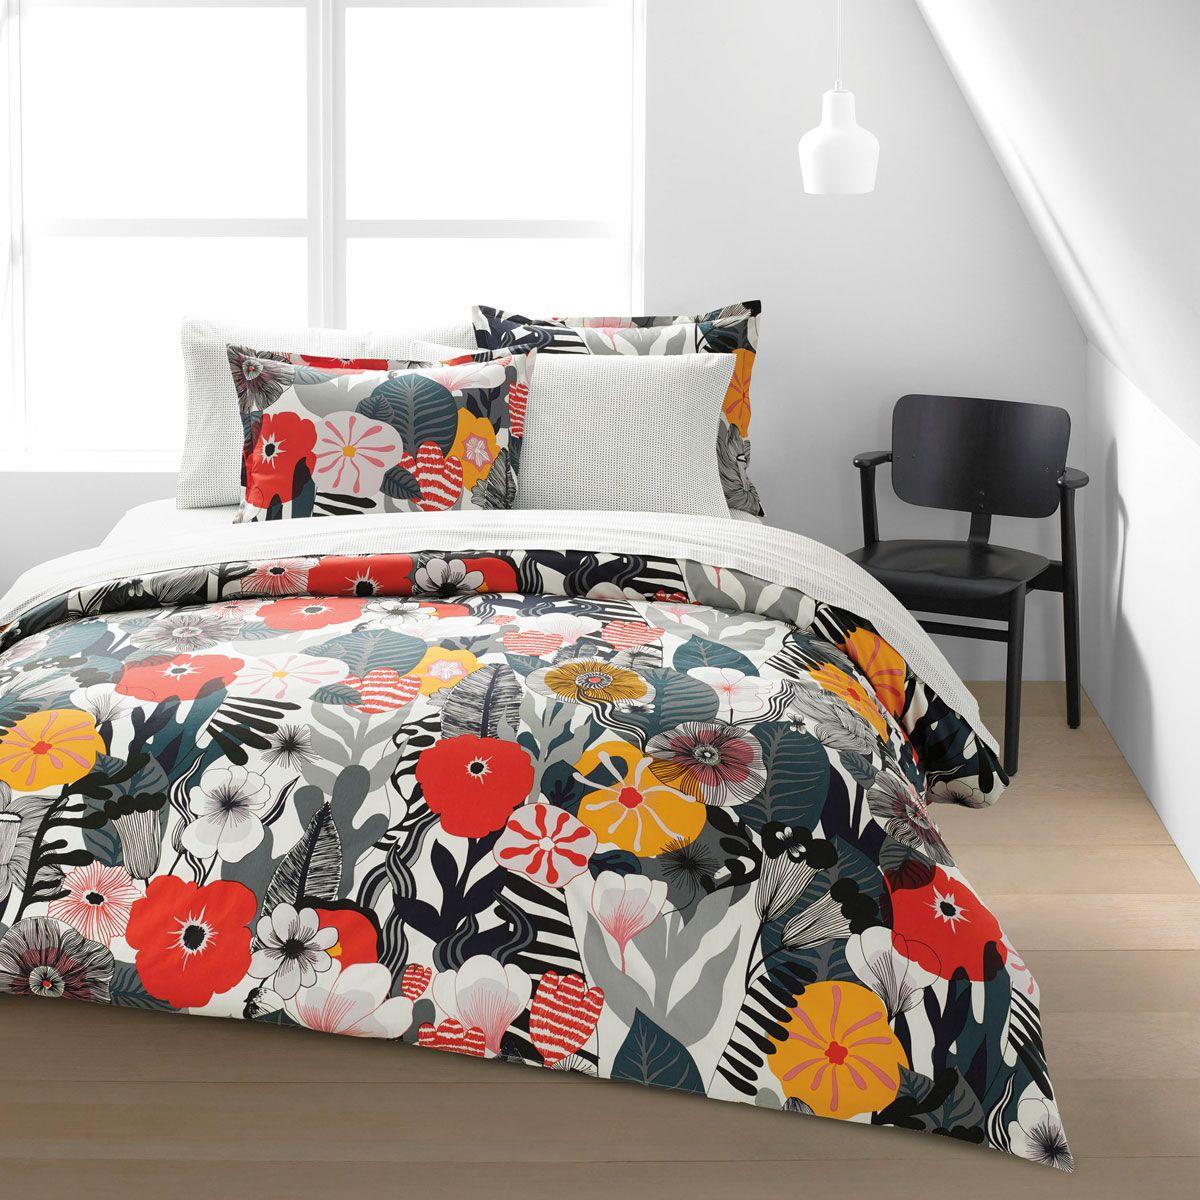 Marimeko Duvet Covers With Images Marimekko Bedding Modern